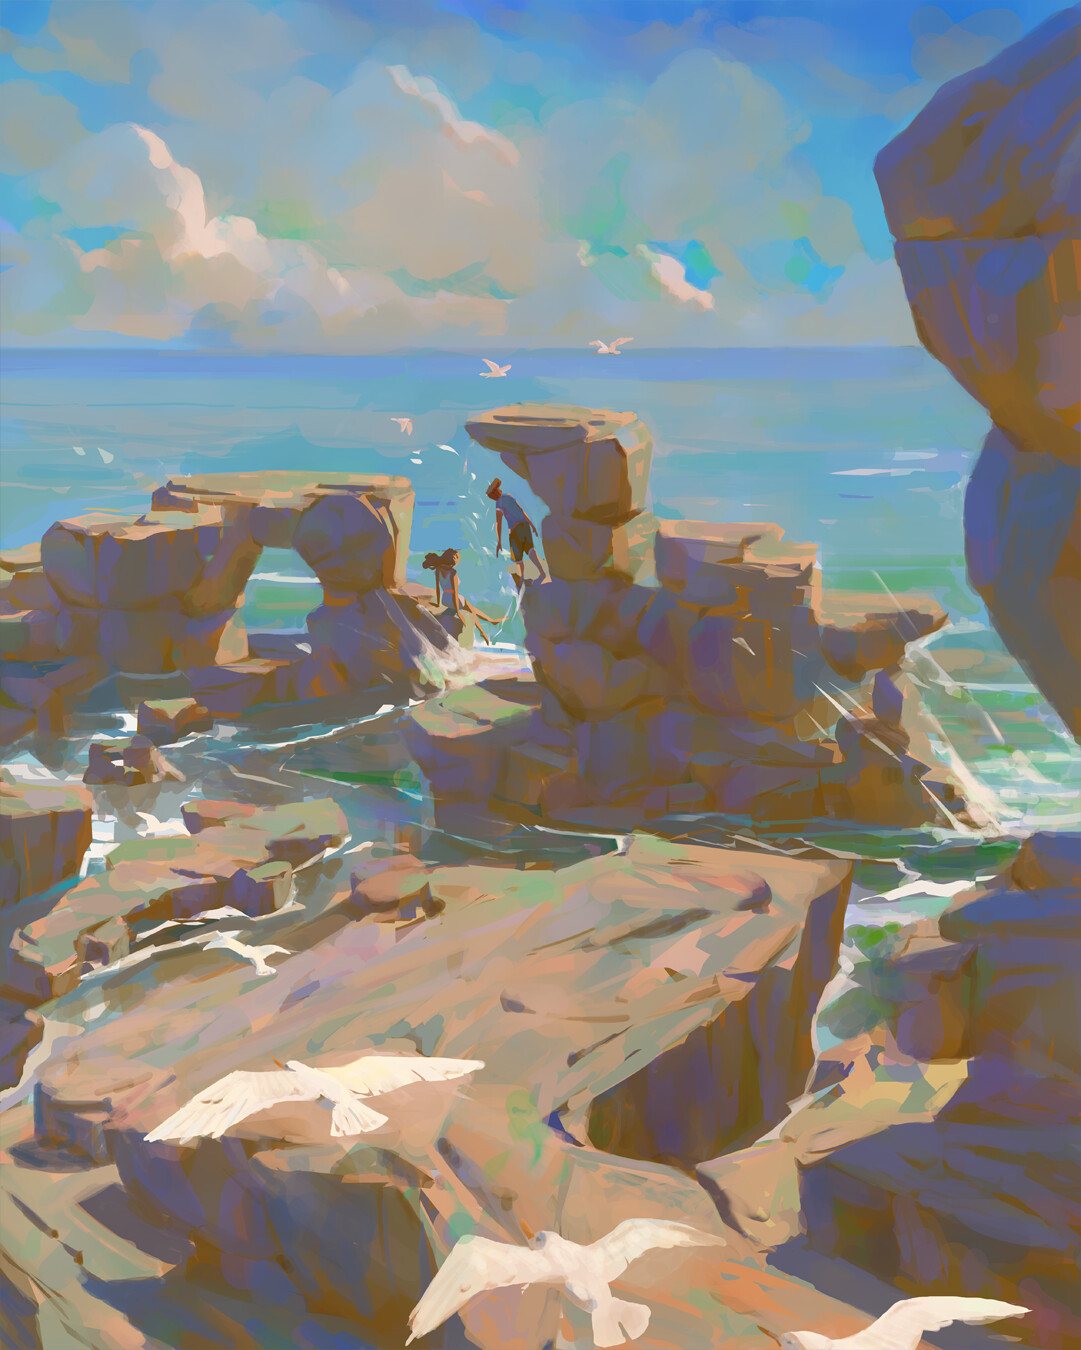 Desert Island by Slawek Fedorczuk